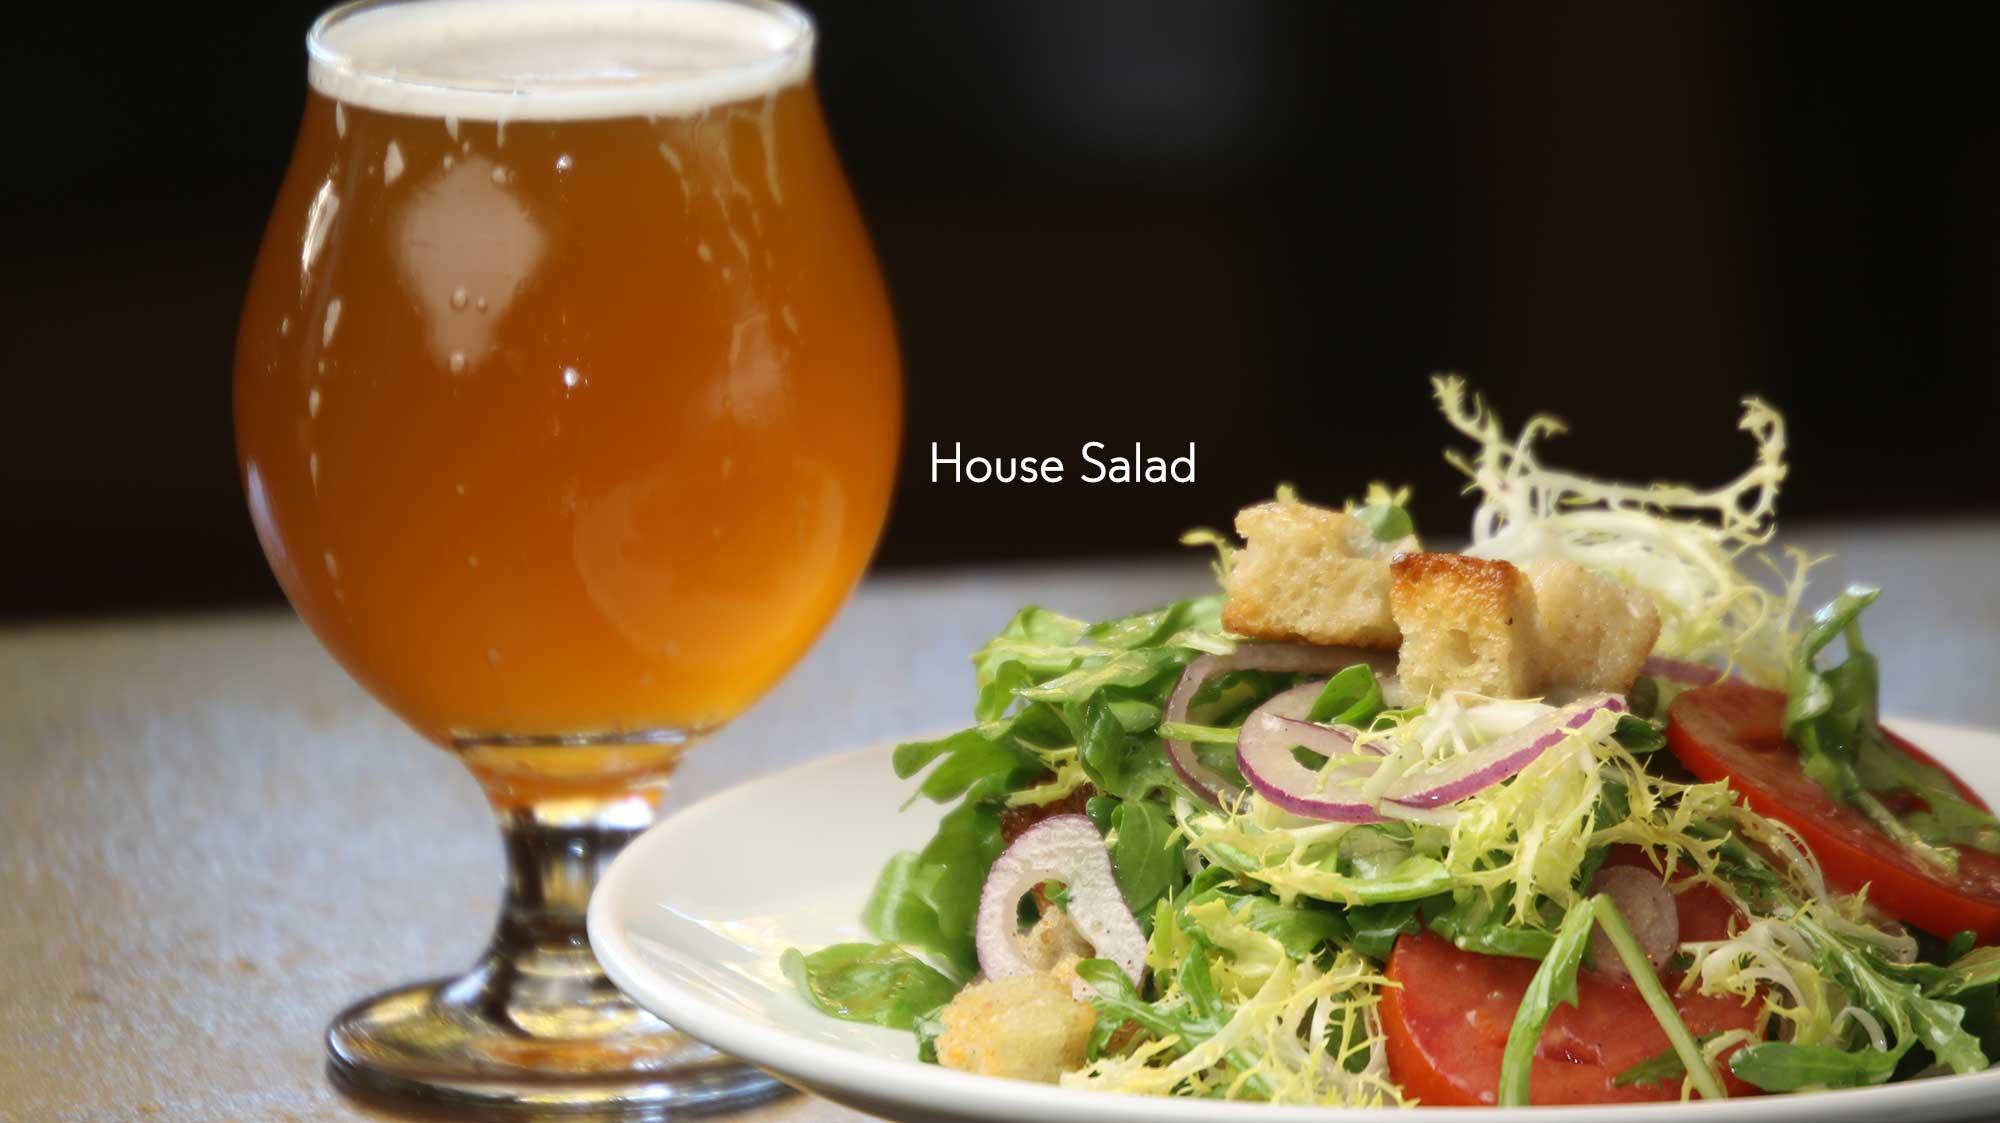 House-Salad-Olaf's-Ballard.jpg